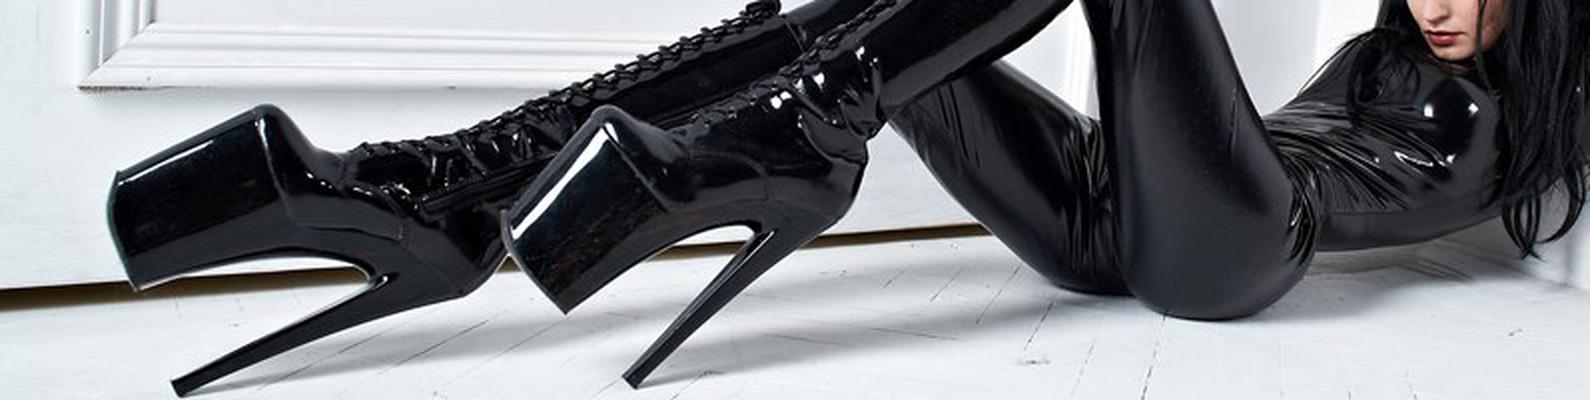 спец обувь для стриптиза дама